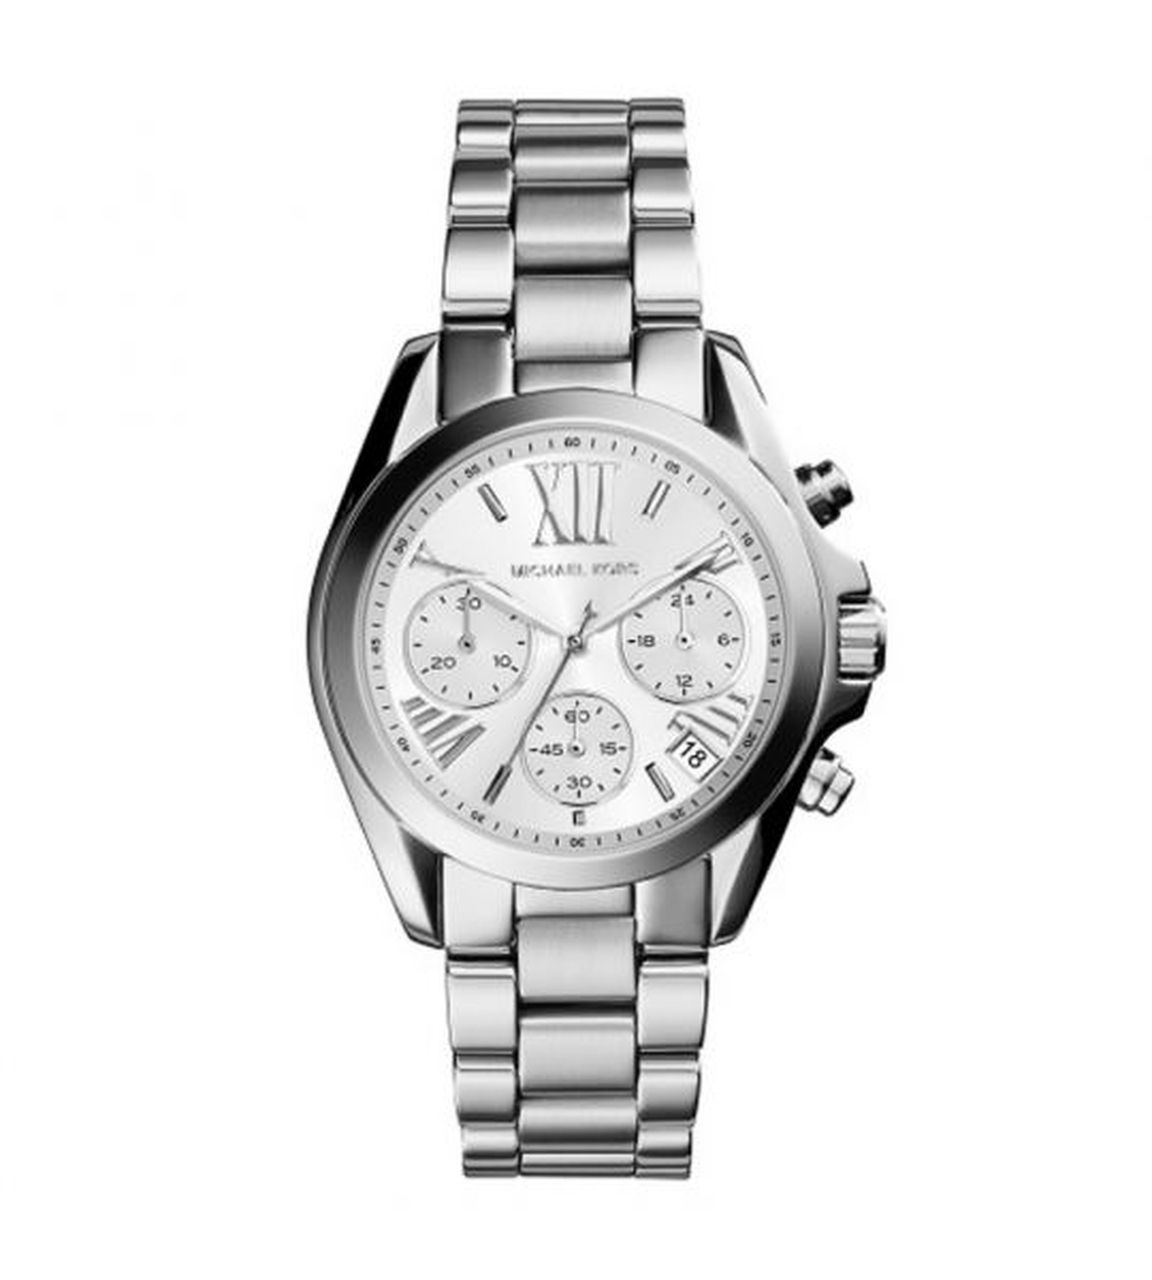 Relógio Michael Kors Bradshaw  Feminino mk6174/1kn Cronógrafo Prata